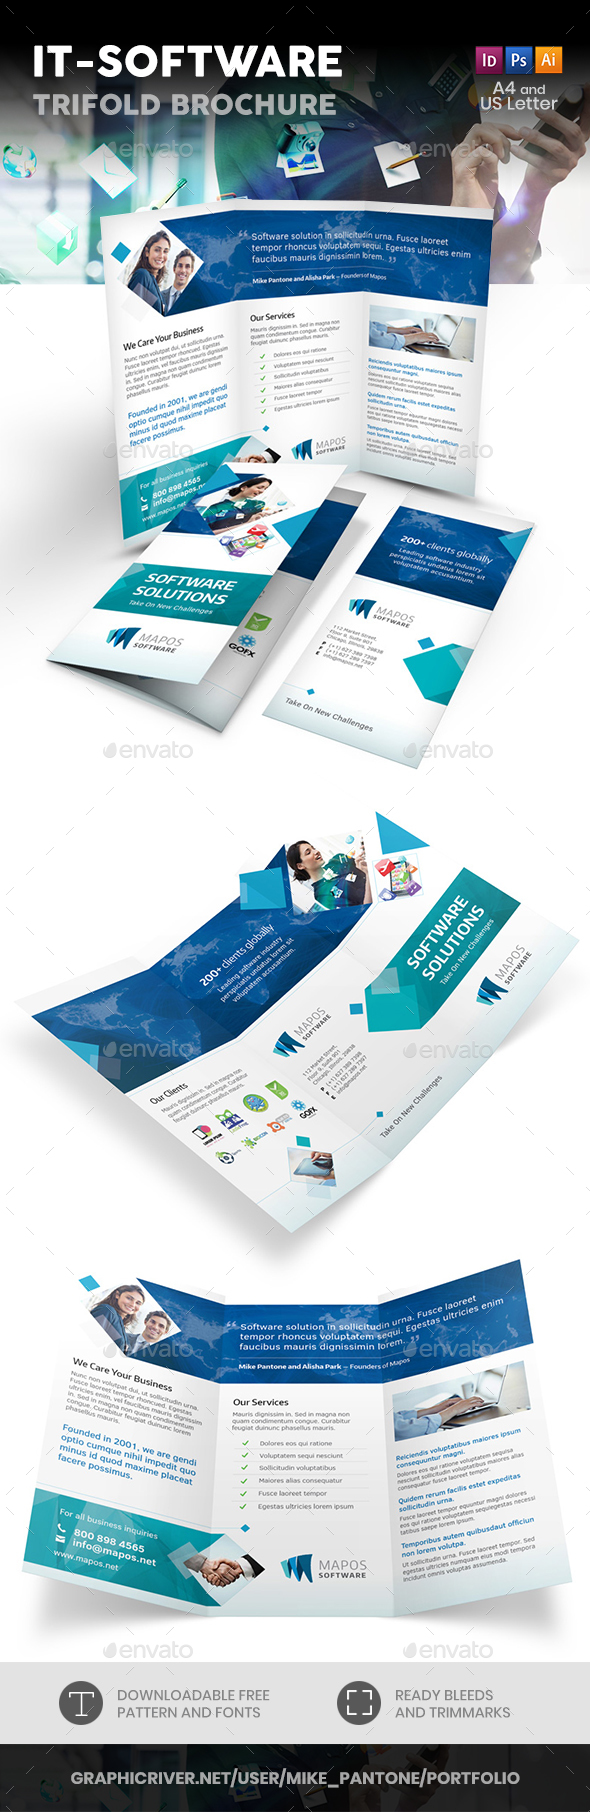 IT – Software Trifold Brochure - Informational Brochures